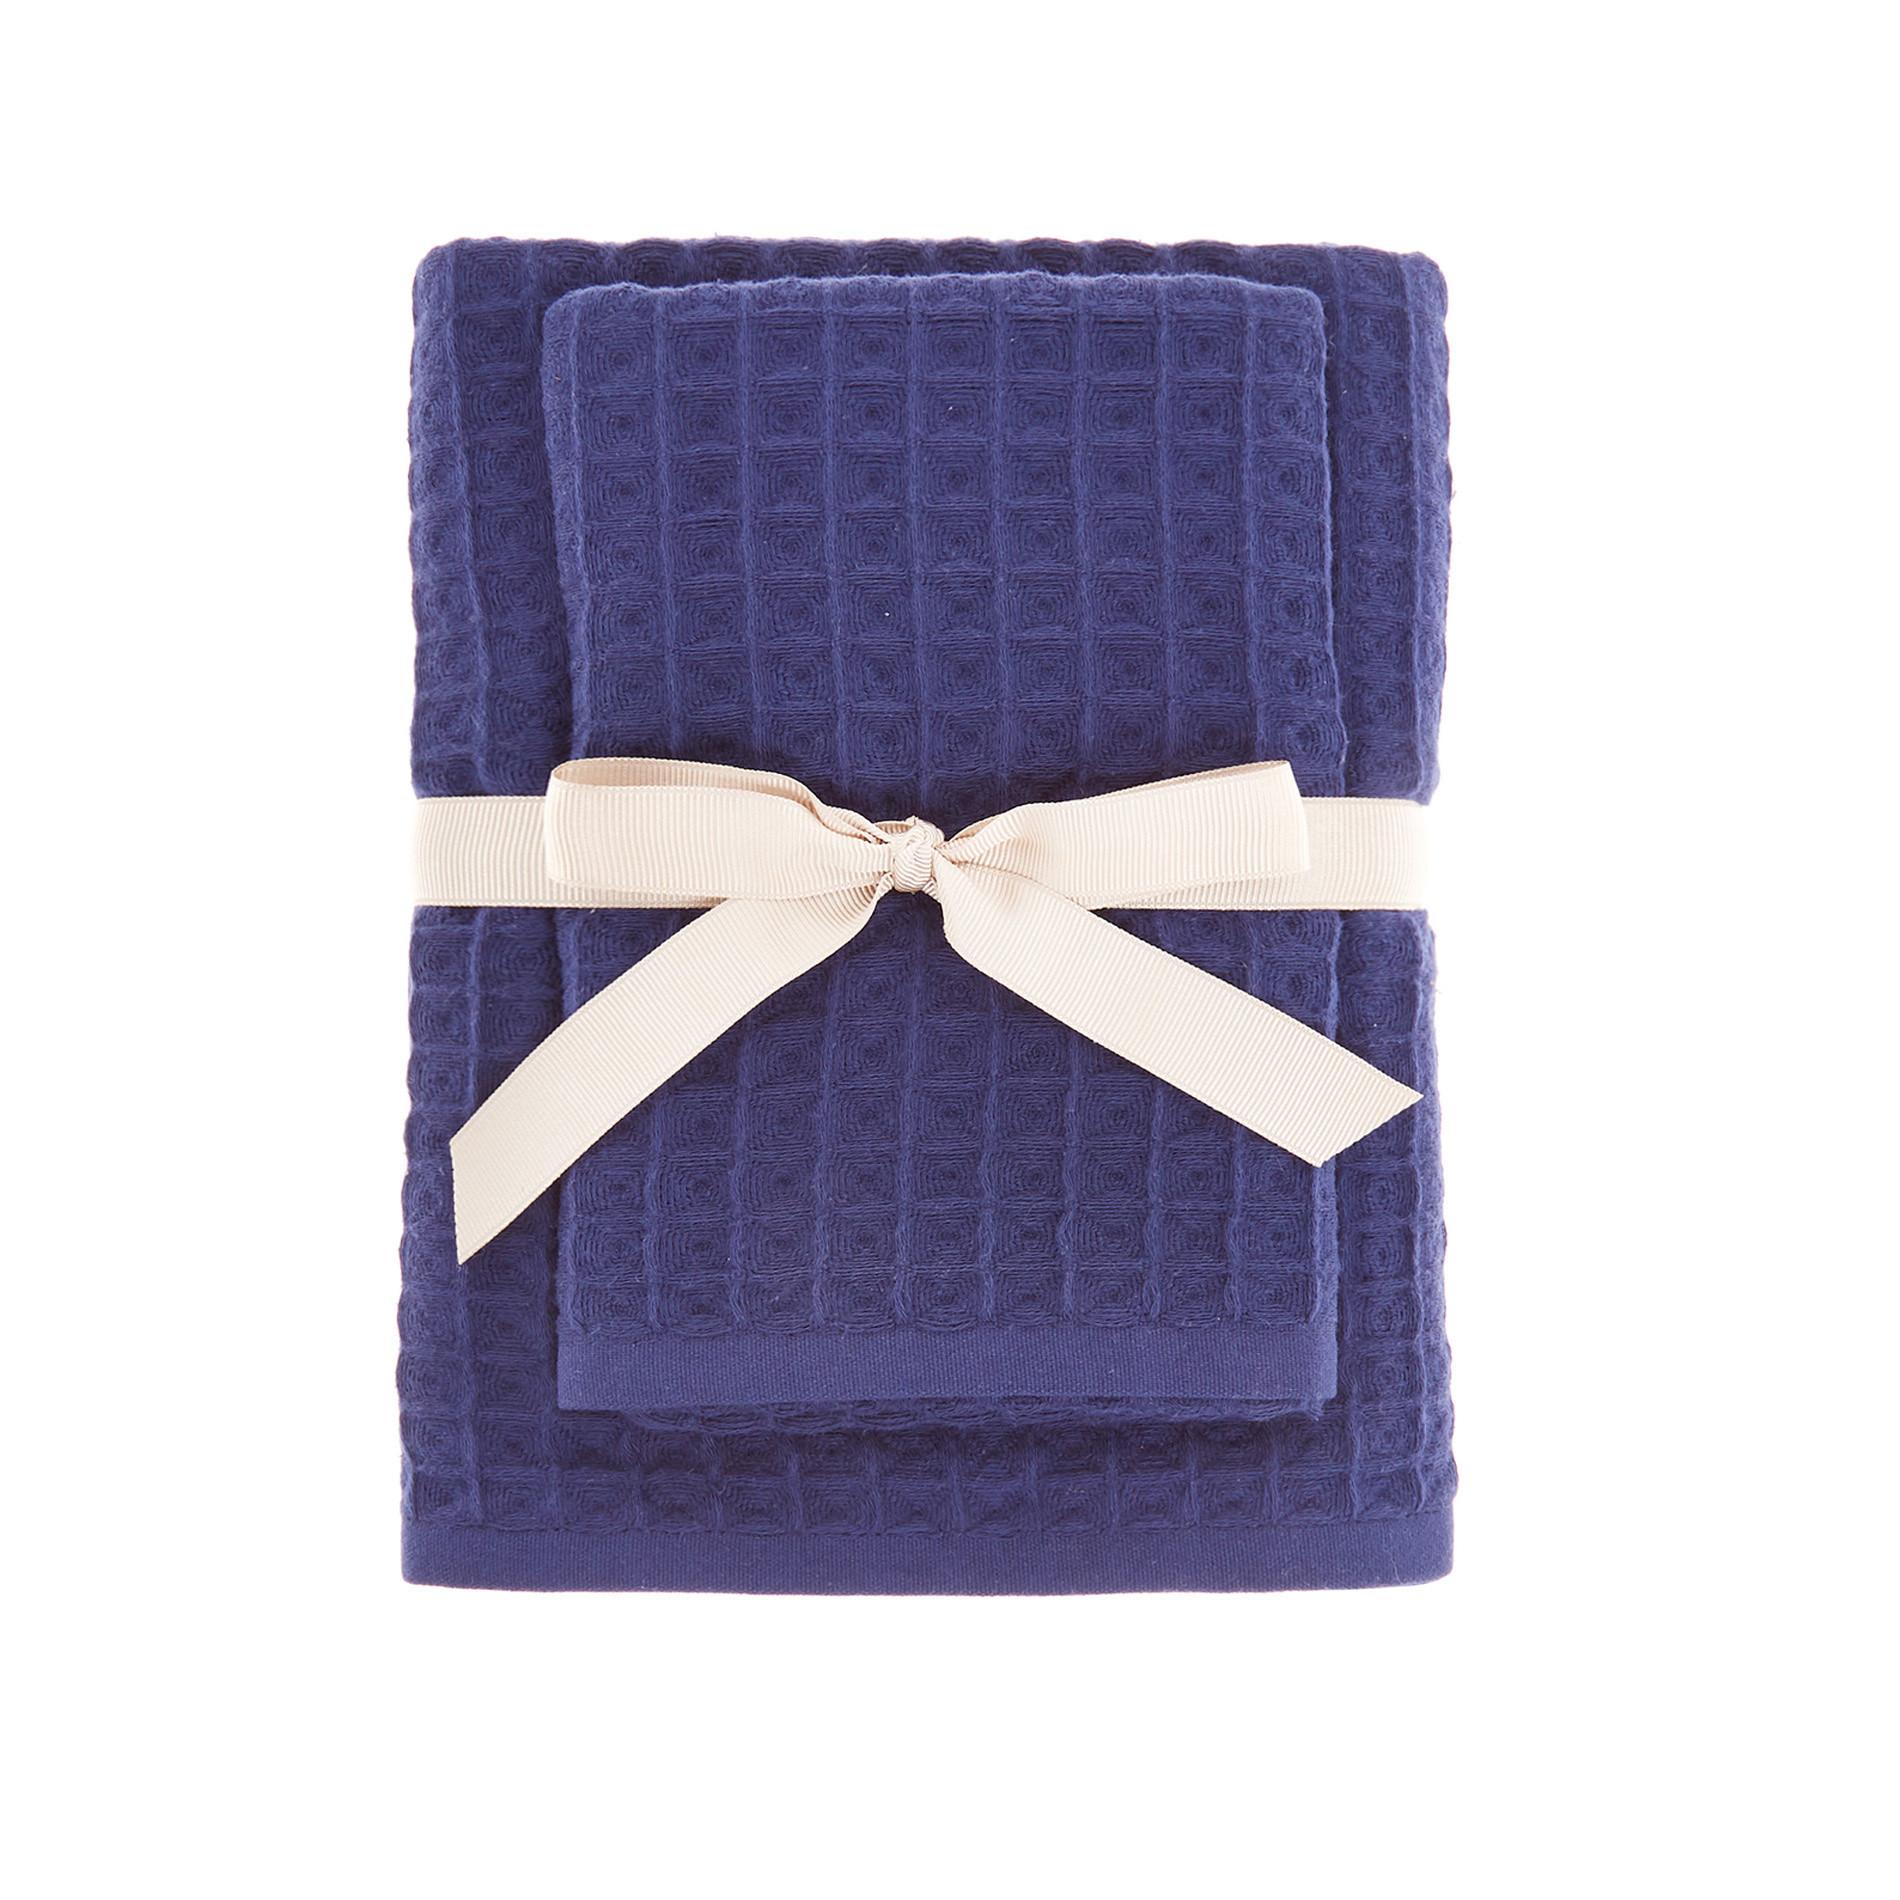 Set asciugamani cotone nido d'ape tinta unita, Blu scuro, large image number 1